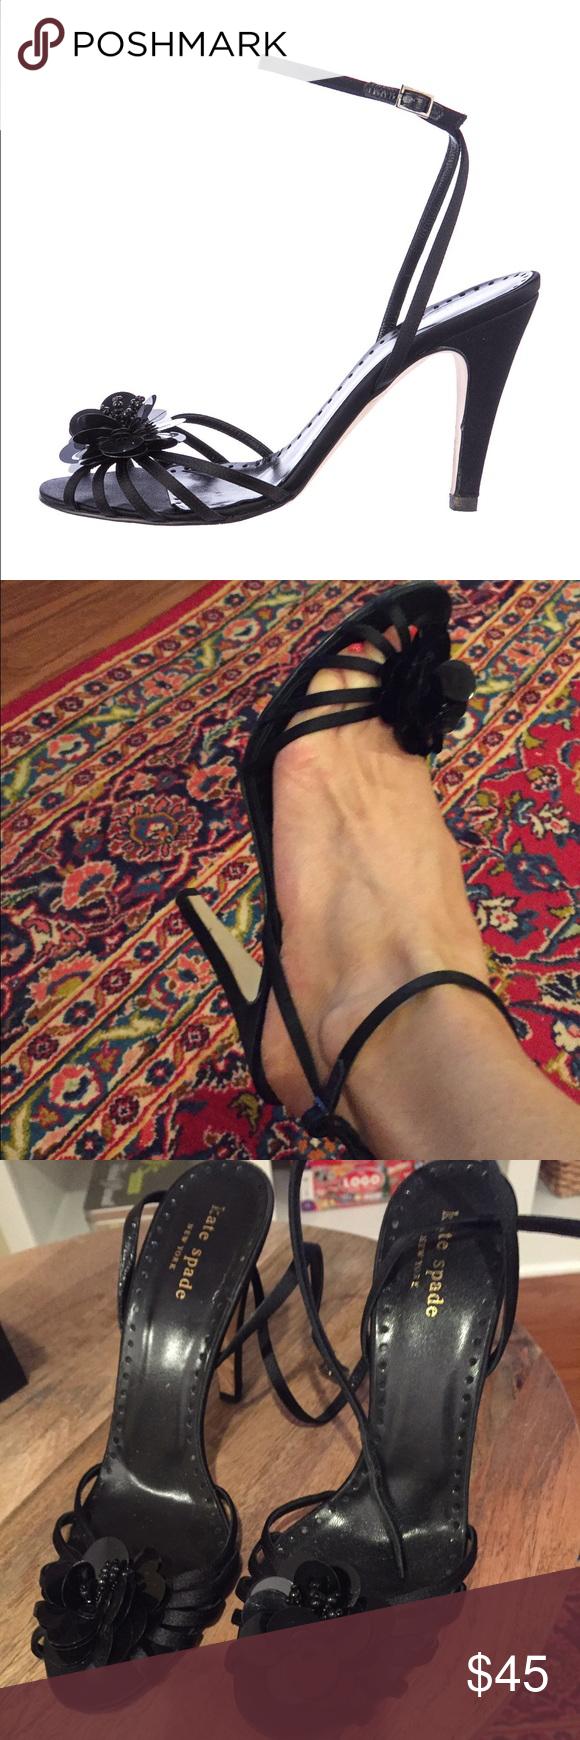 Gorgeous embellished Kate Spade Heels Gorgeous heels!  Embellished!  Like new! kate spade Shoes Heels